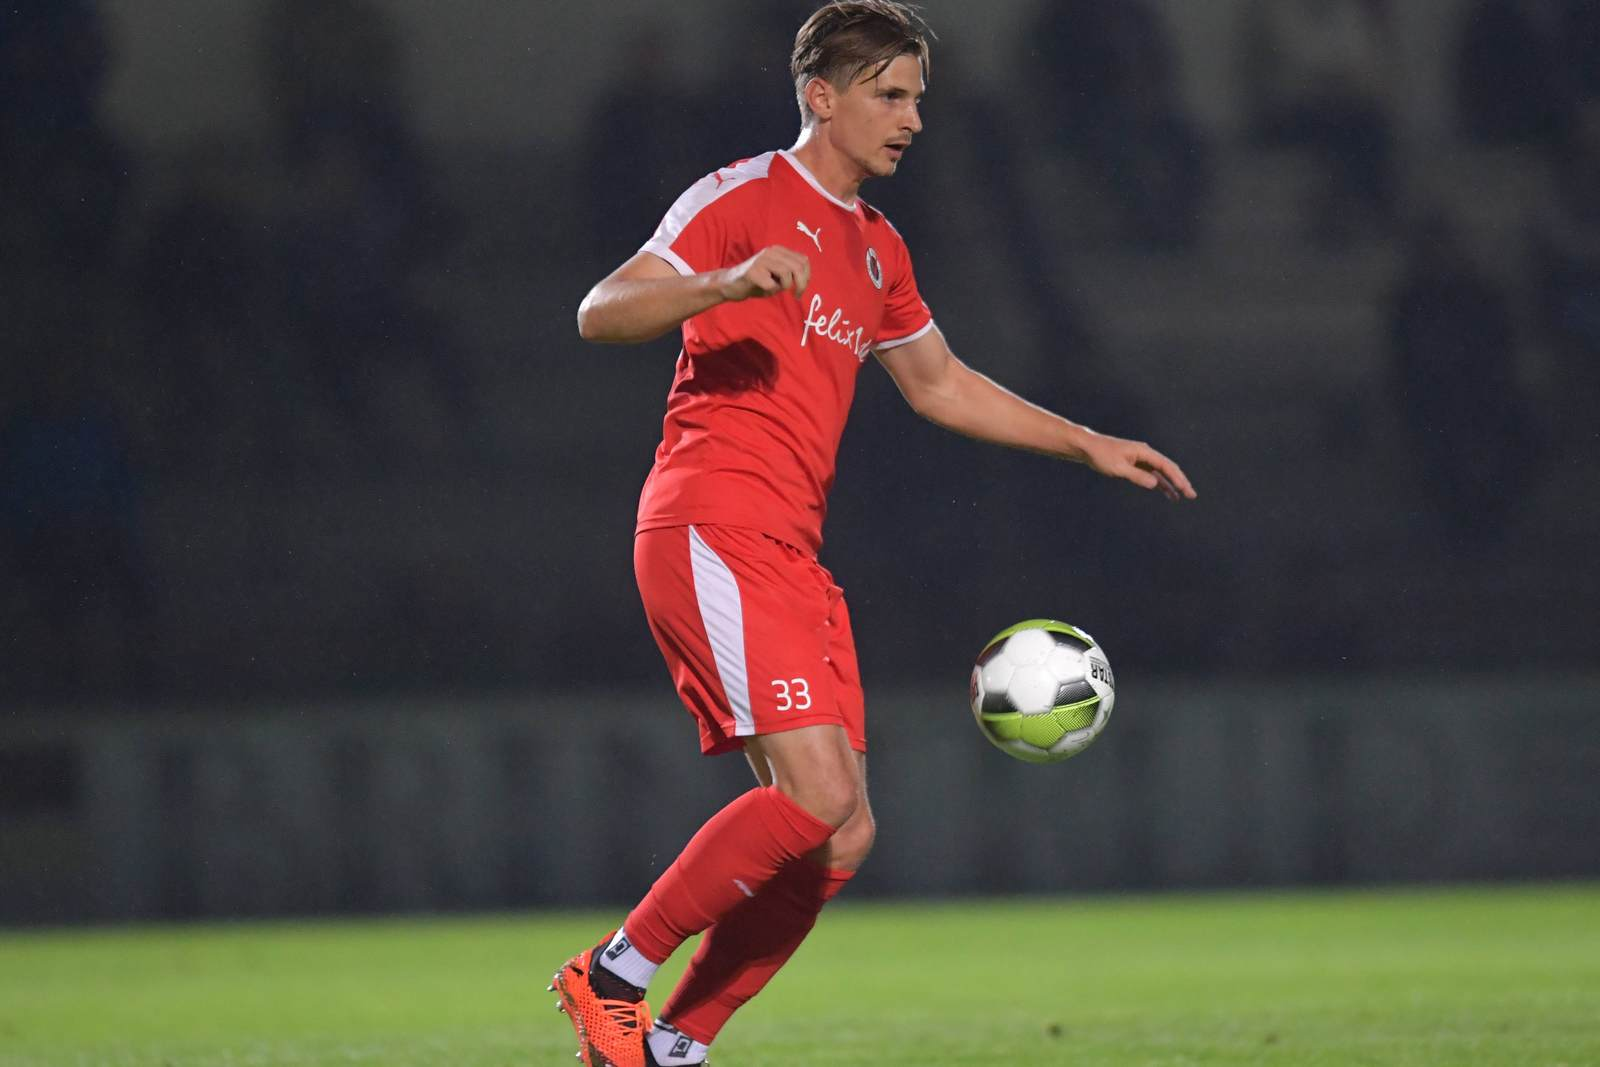 Sebastian Wimmer am Ball für Viktoria Köln